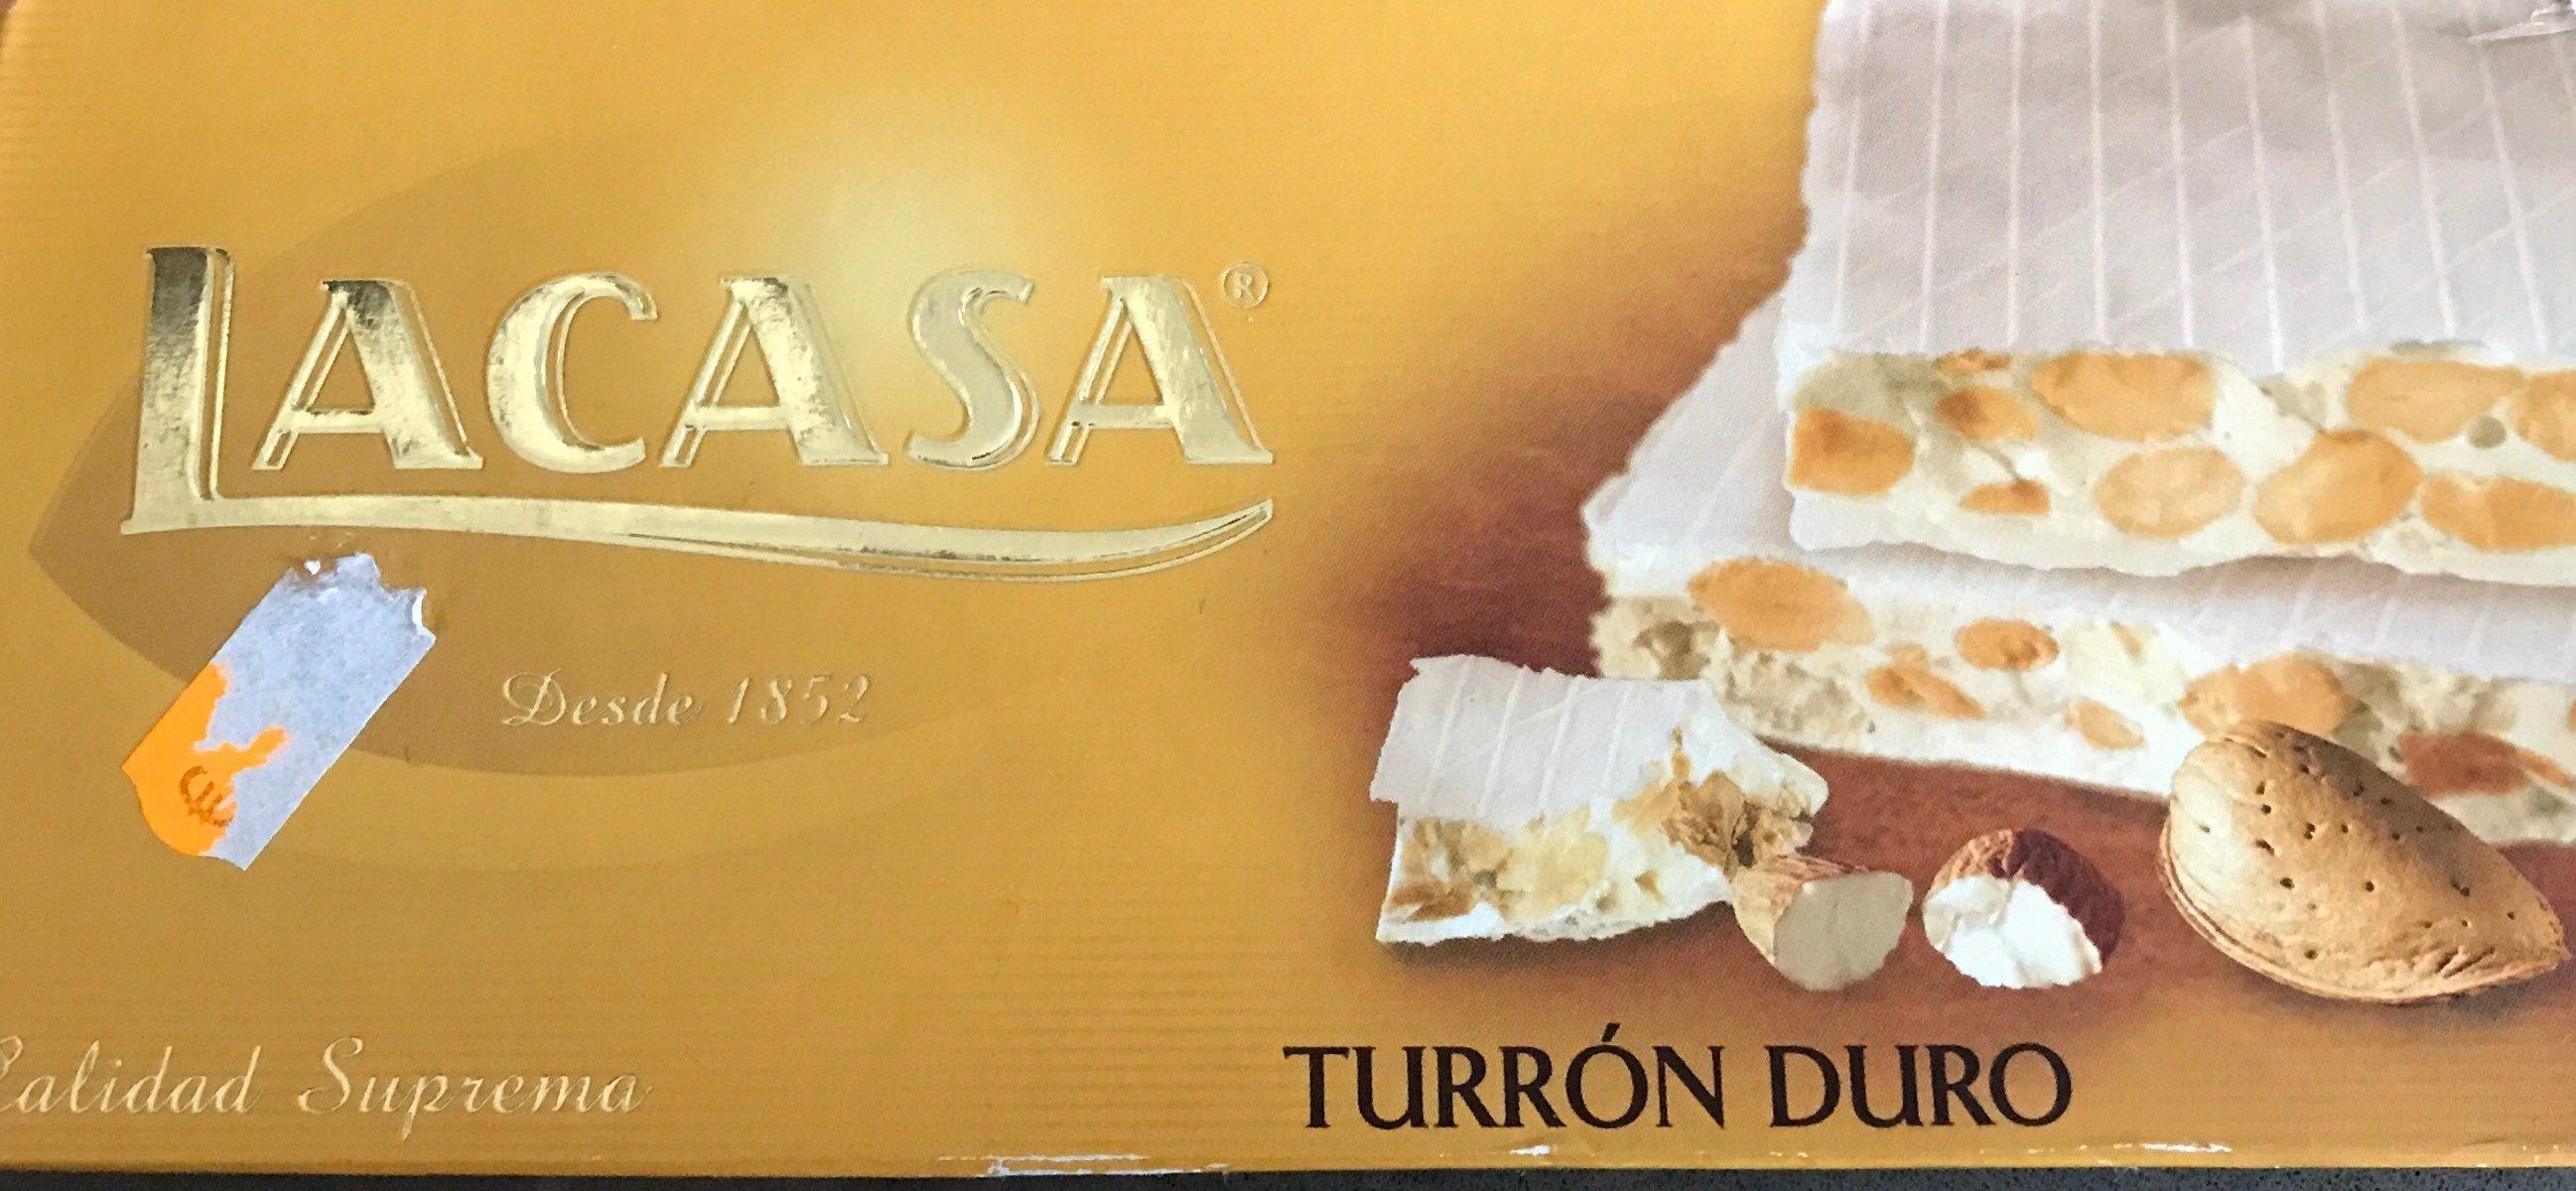 Turron Duro Lacasa - Product